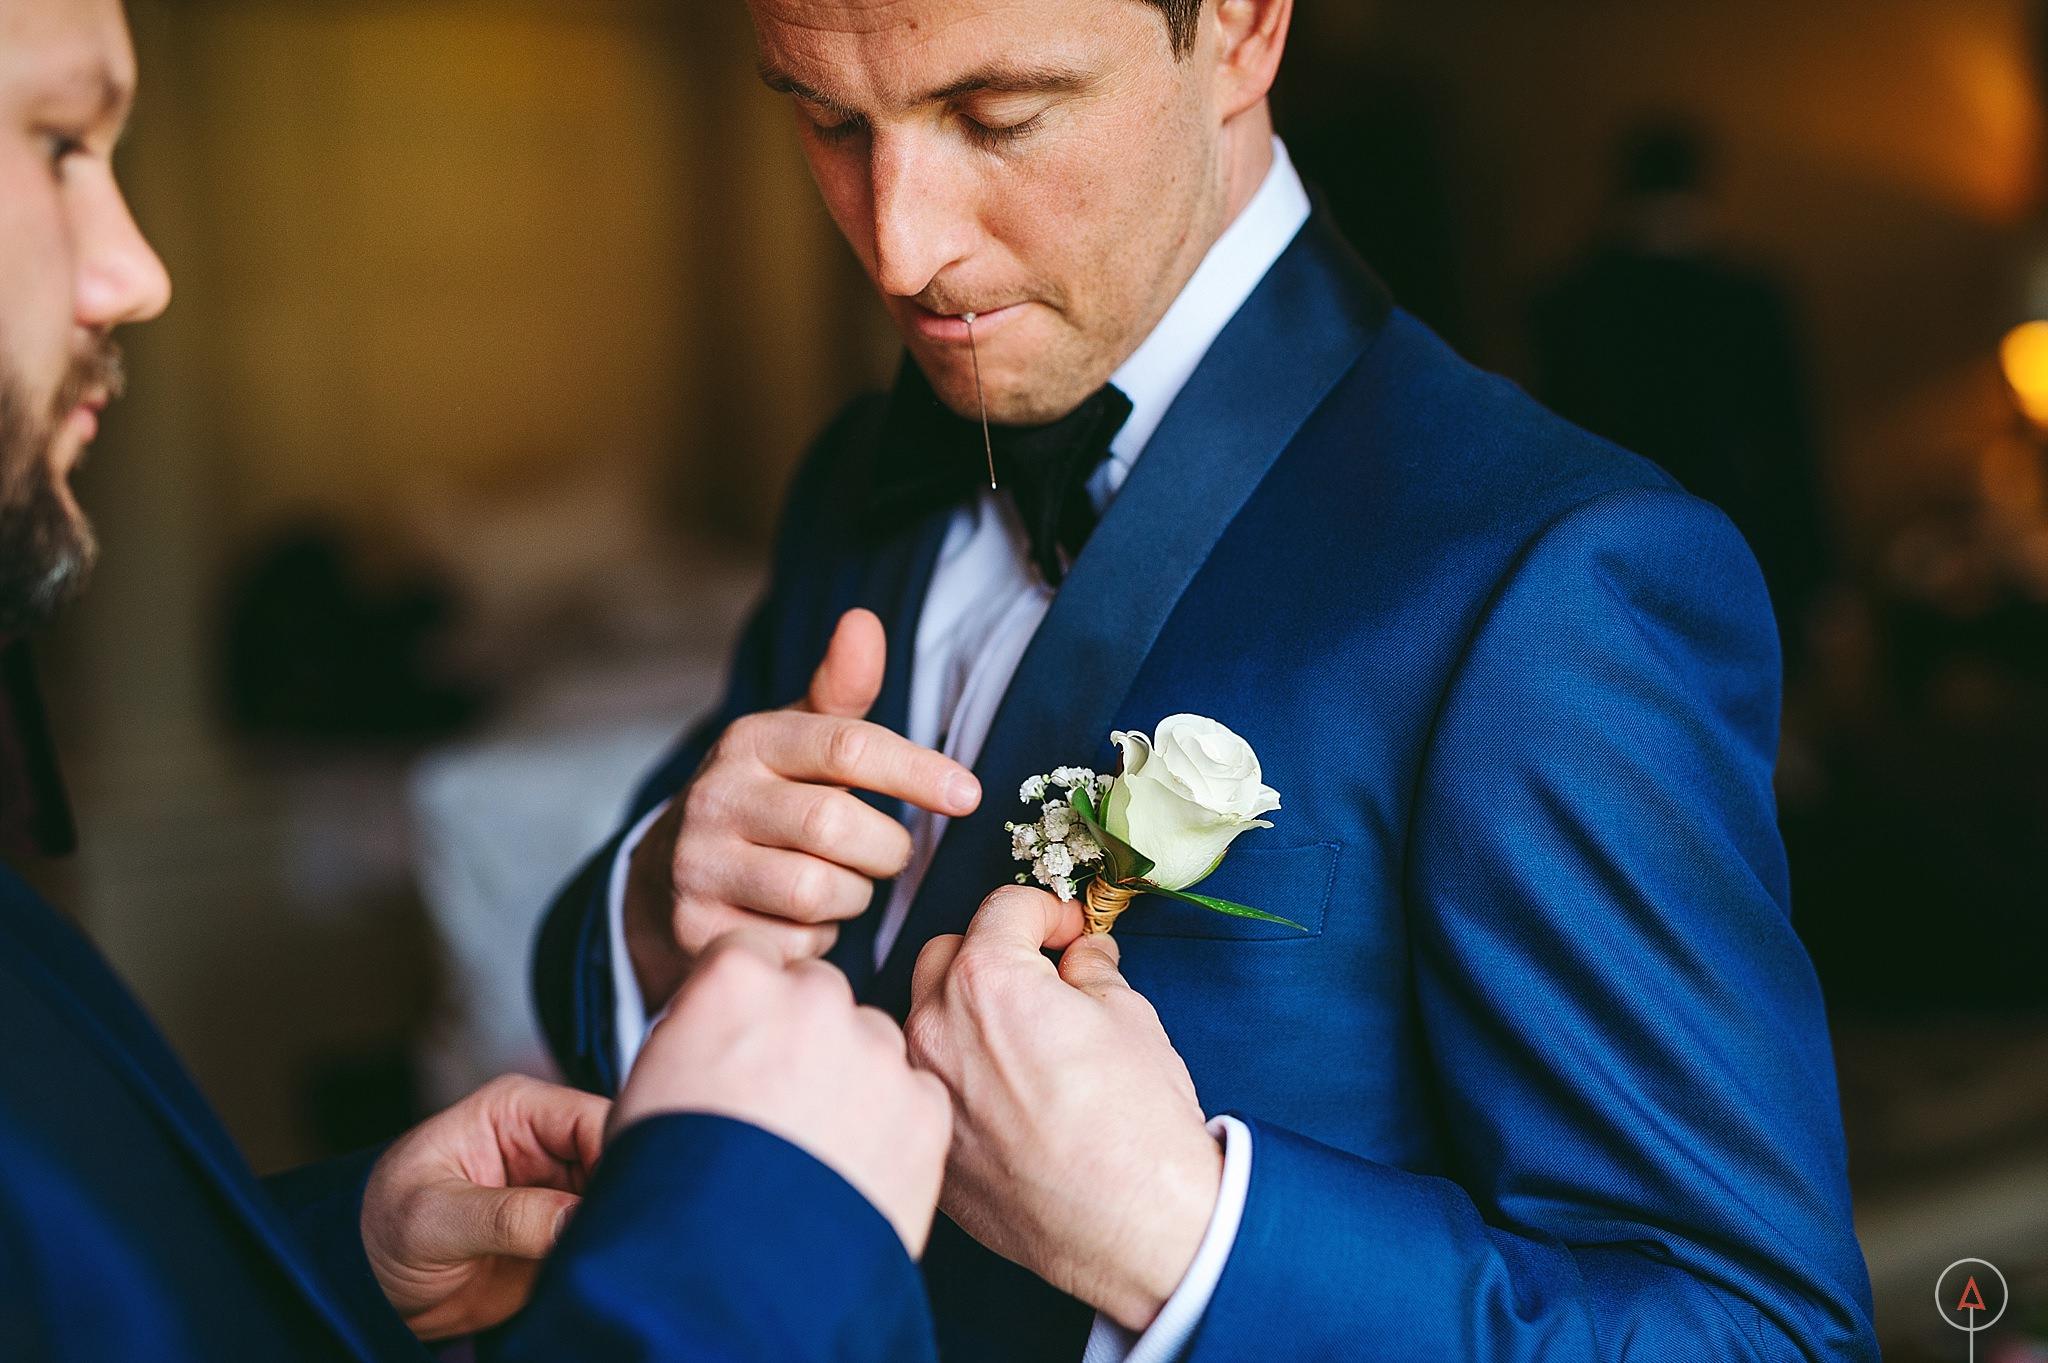 cardiff-wedding-photographer-aga-tomaszek_0235